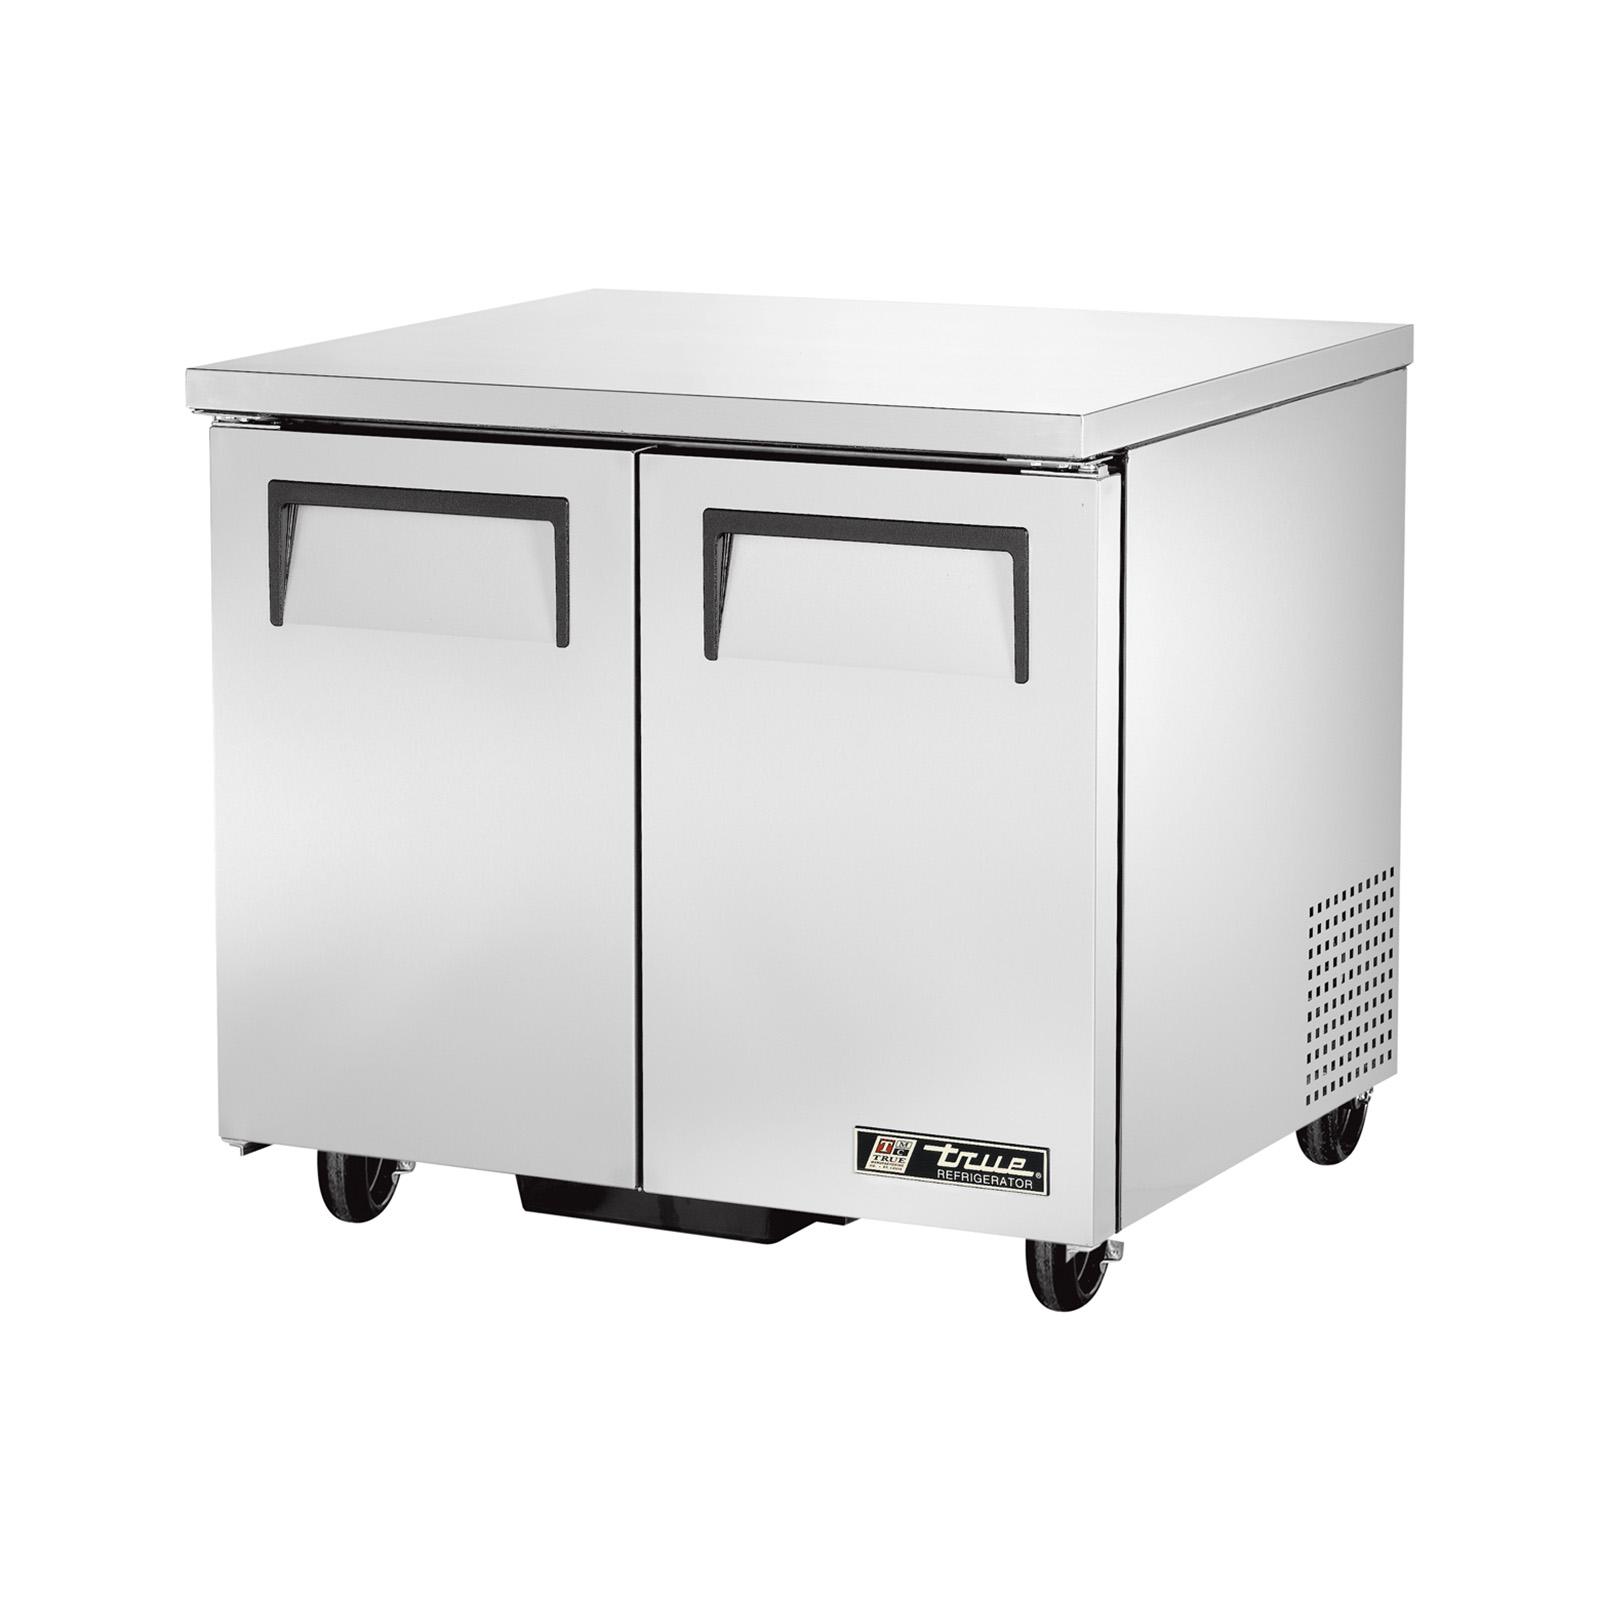 TUC 36 True   Undercounter Refrigerator 33 38? F